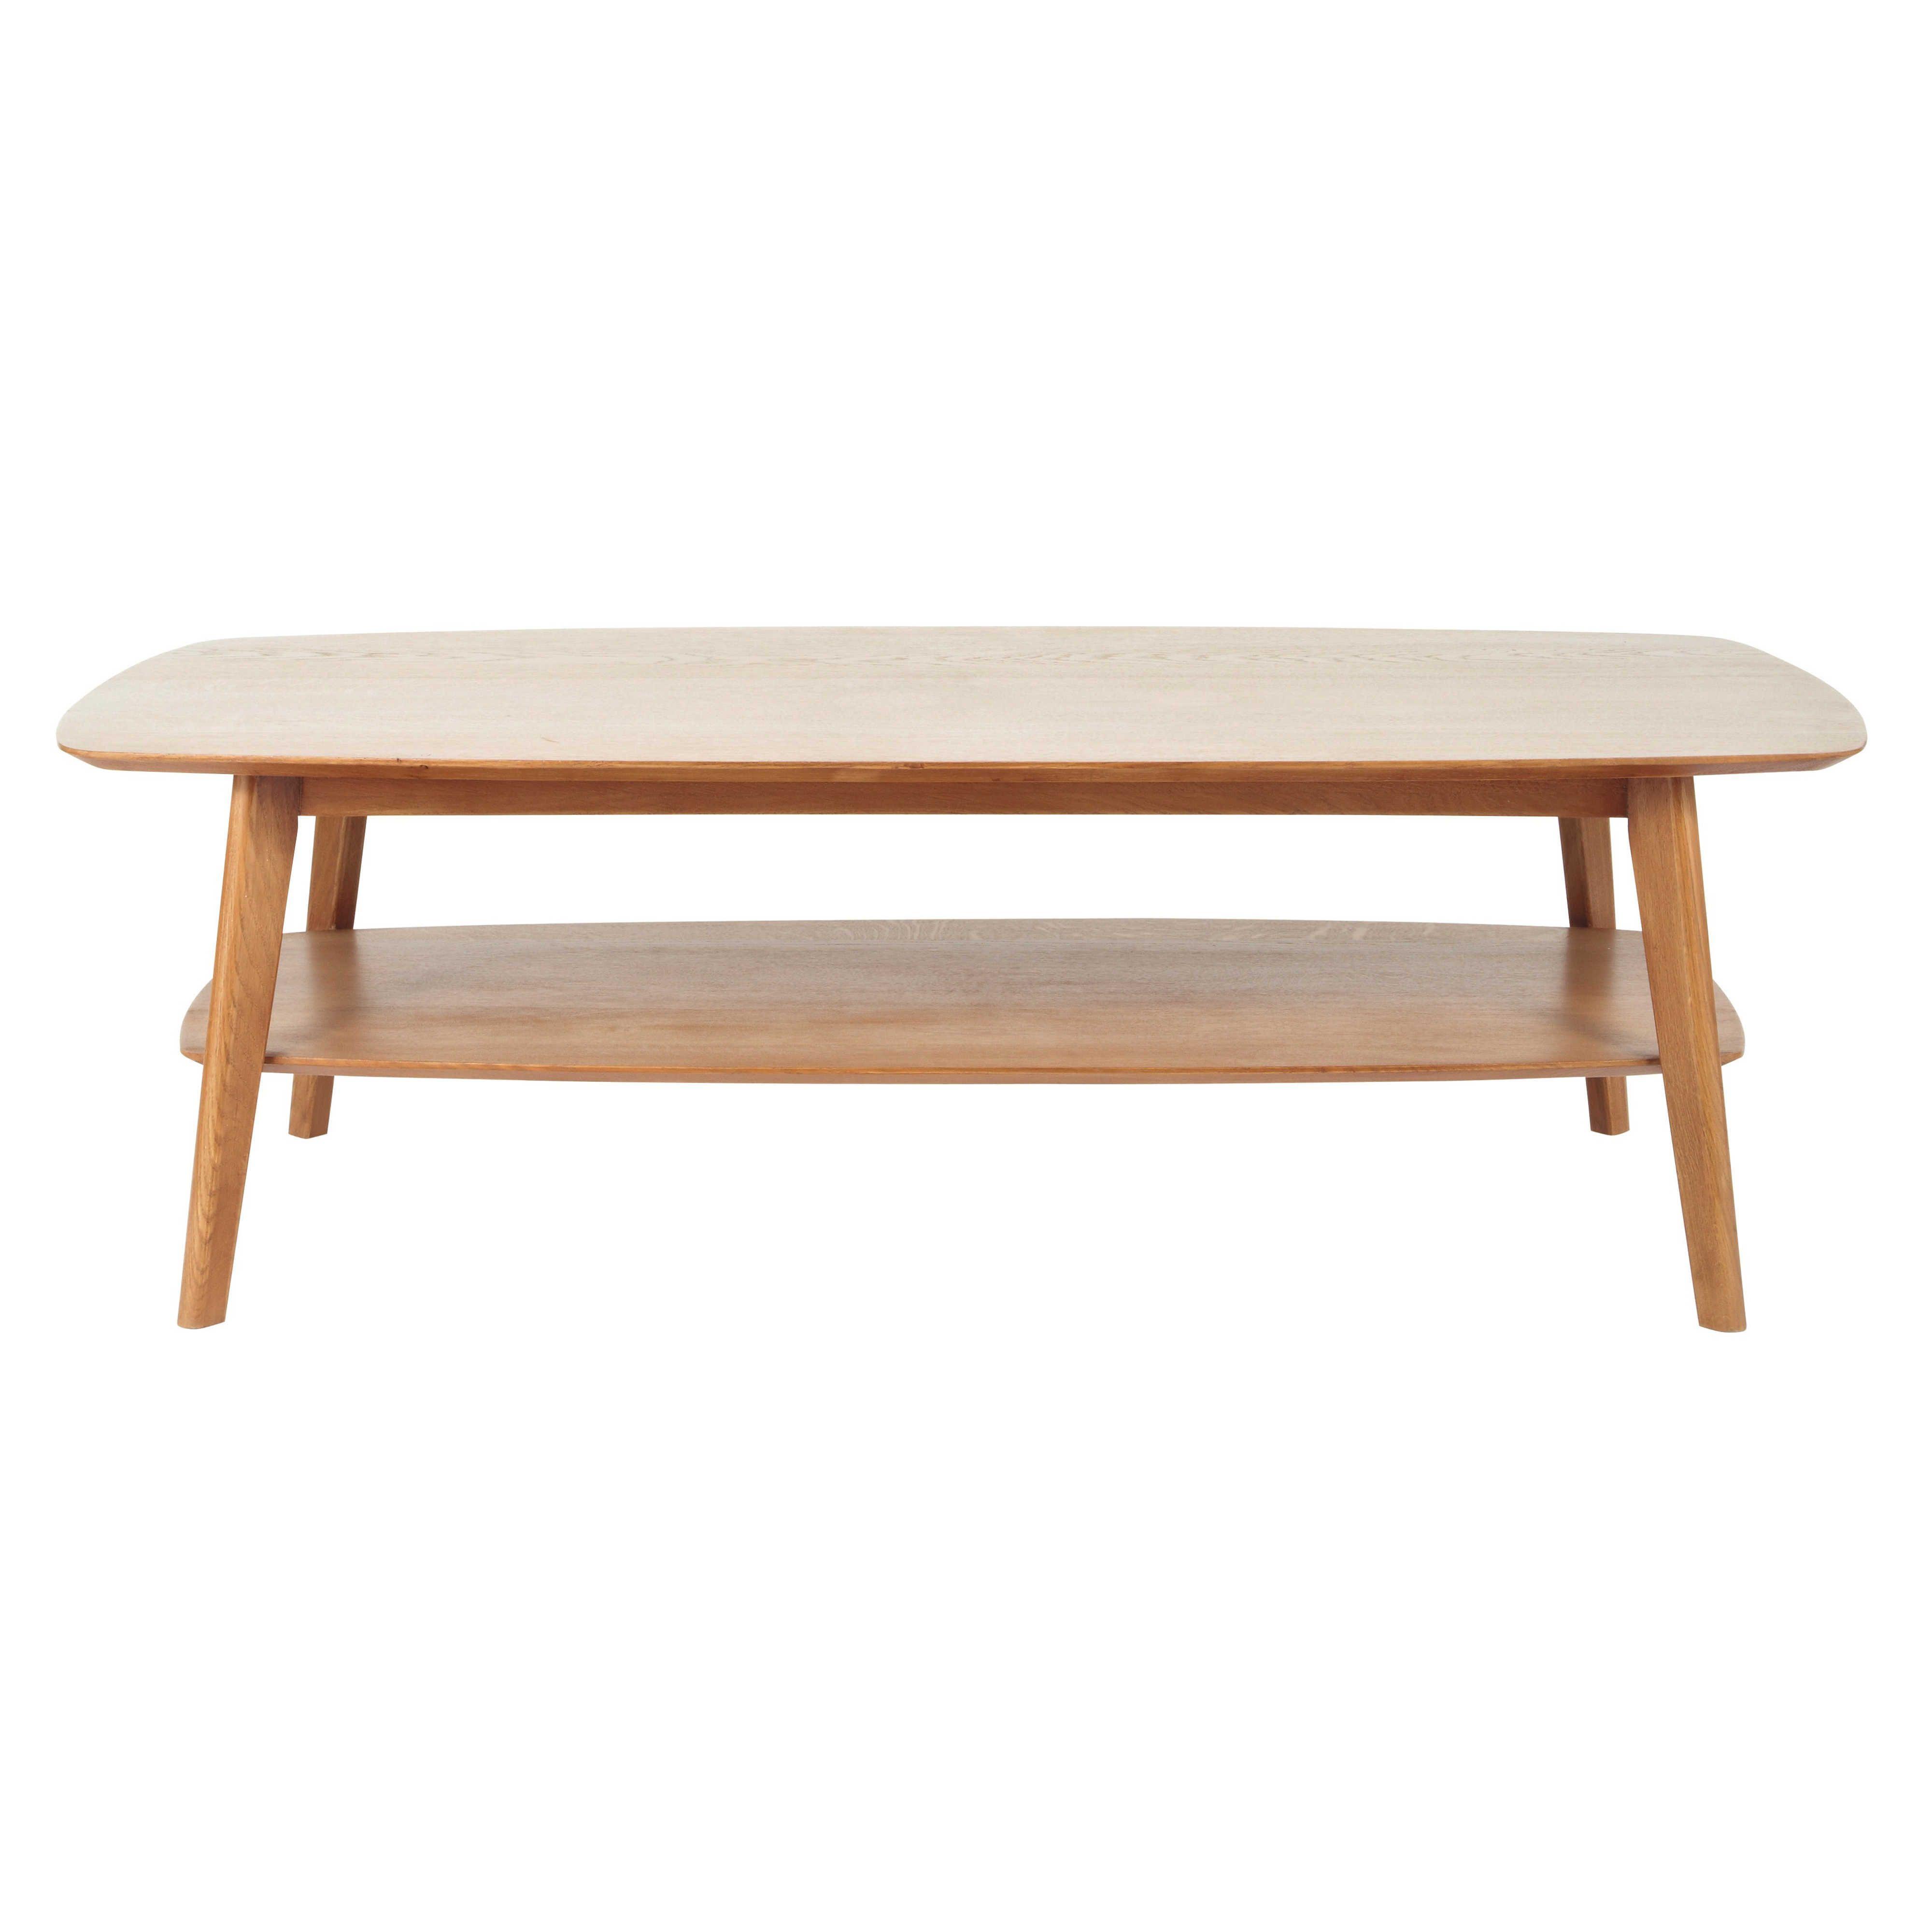 Table Basse En Chêne Massif L 130 Cm Portobello Tables Basses